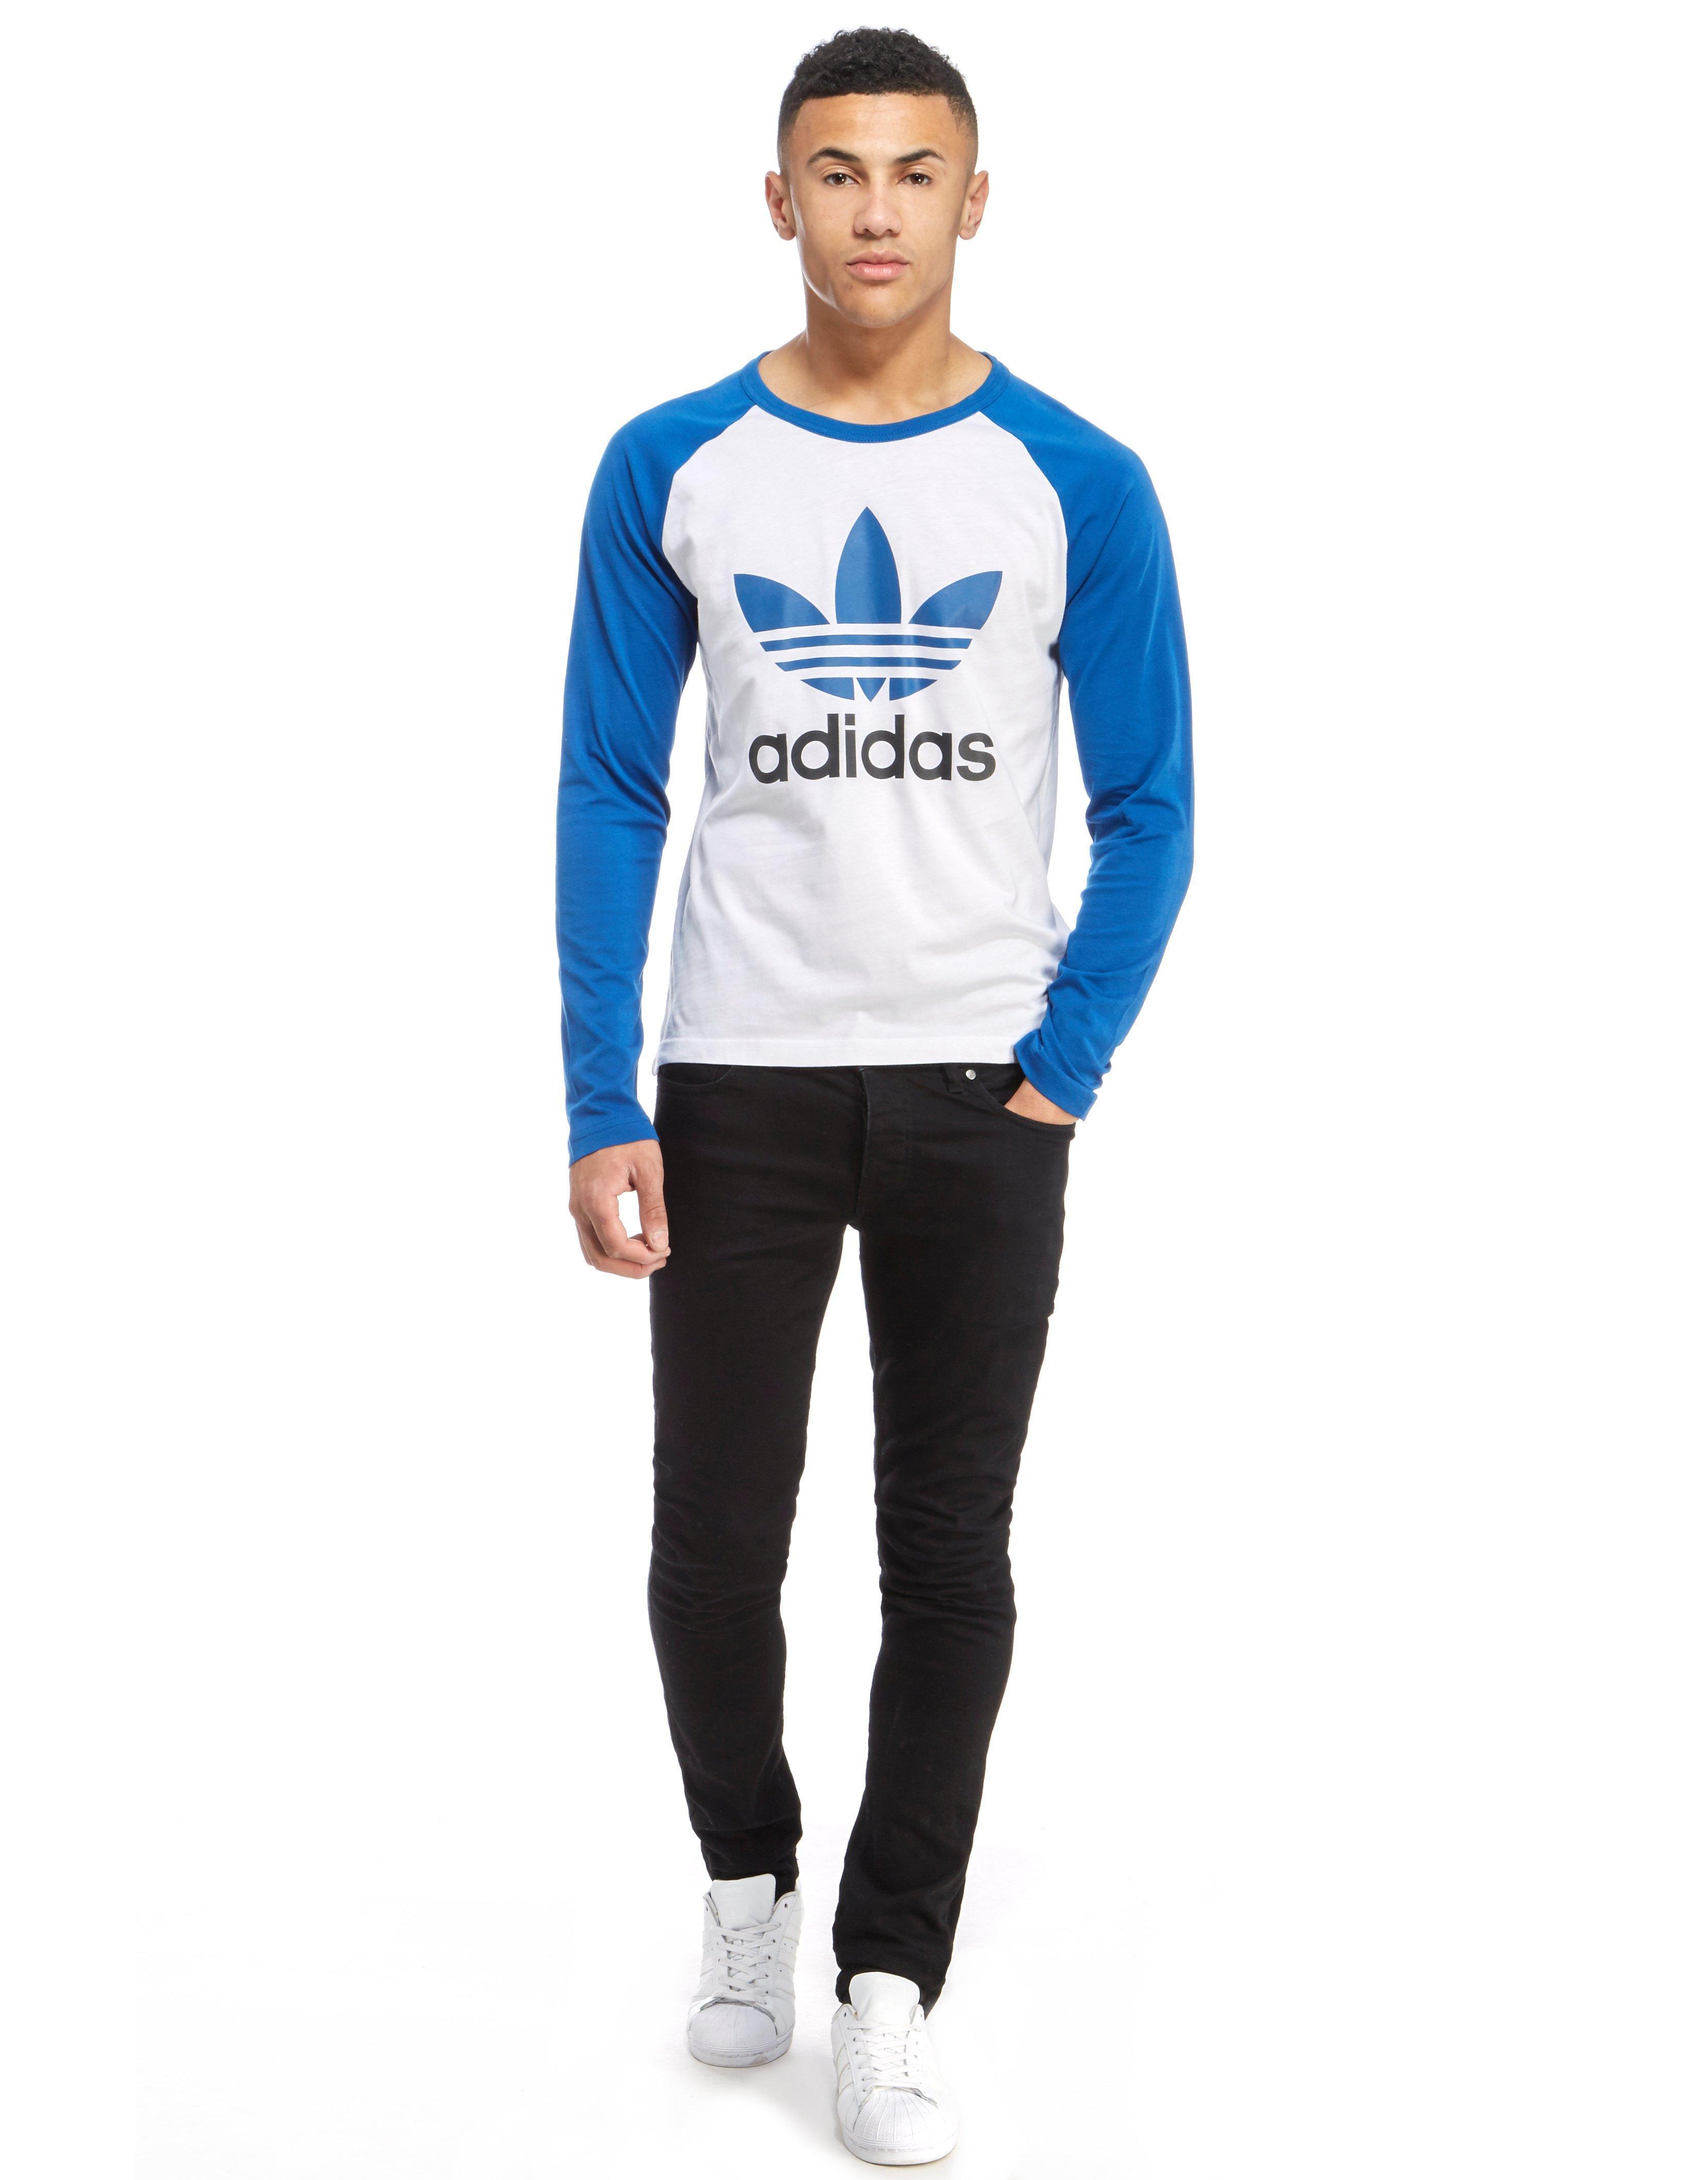 Lyst Adidas Originals Trefoil Longsleeve T Shirt In Blue